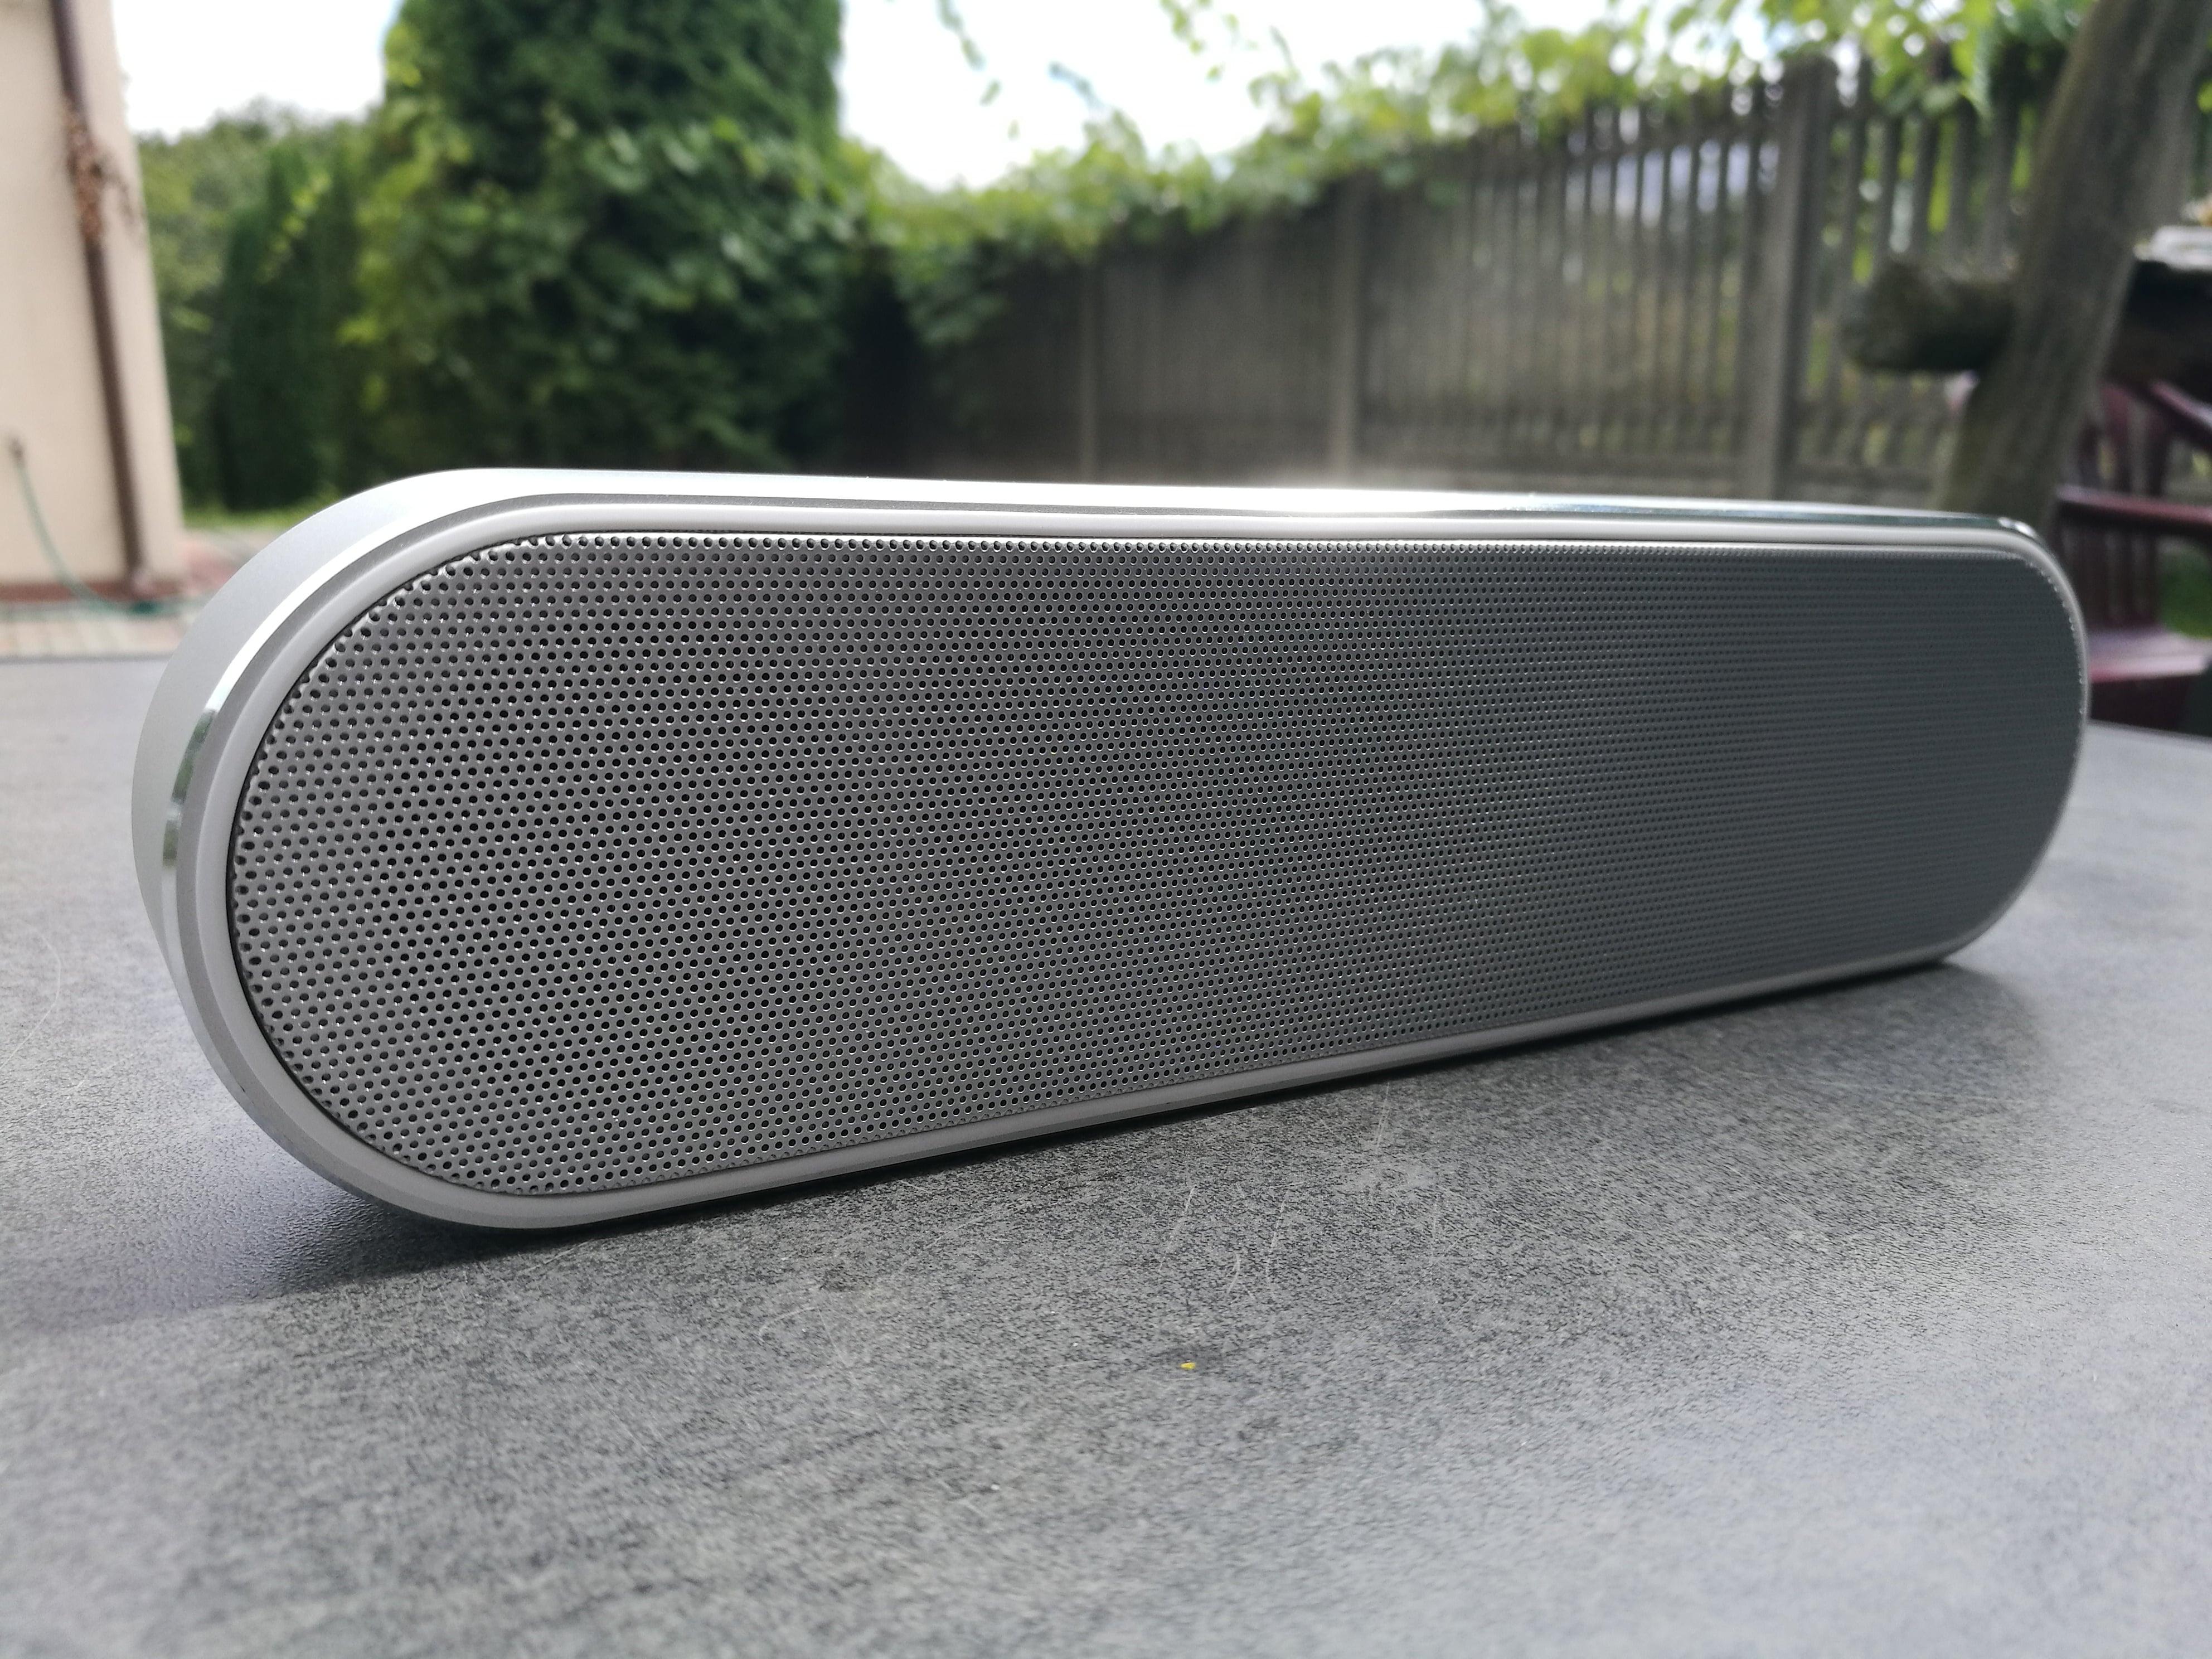 Recenzja głośnika Bluetooth Snab Jukebox JB-21 15